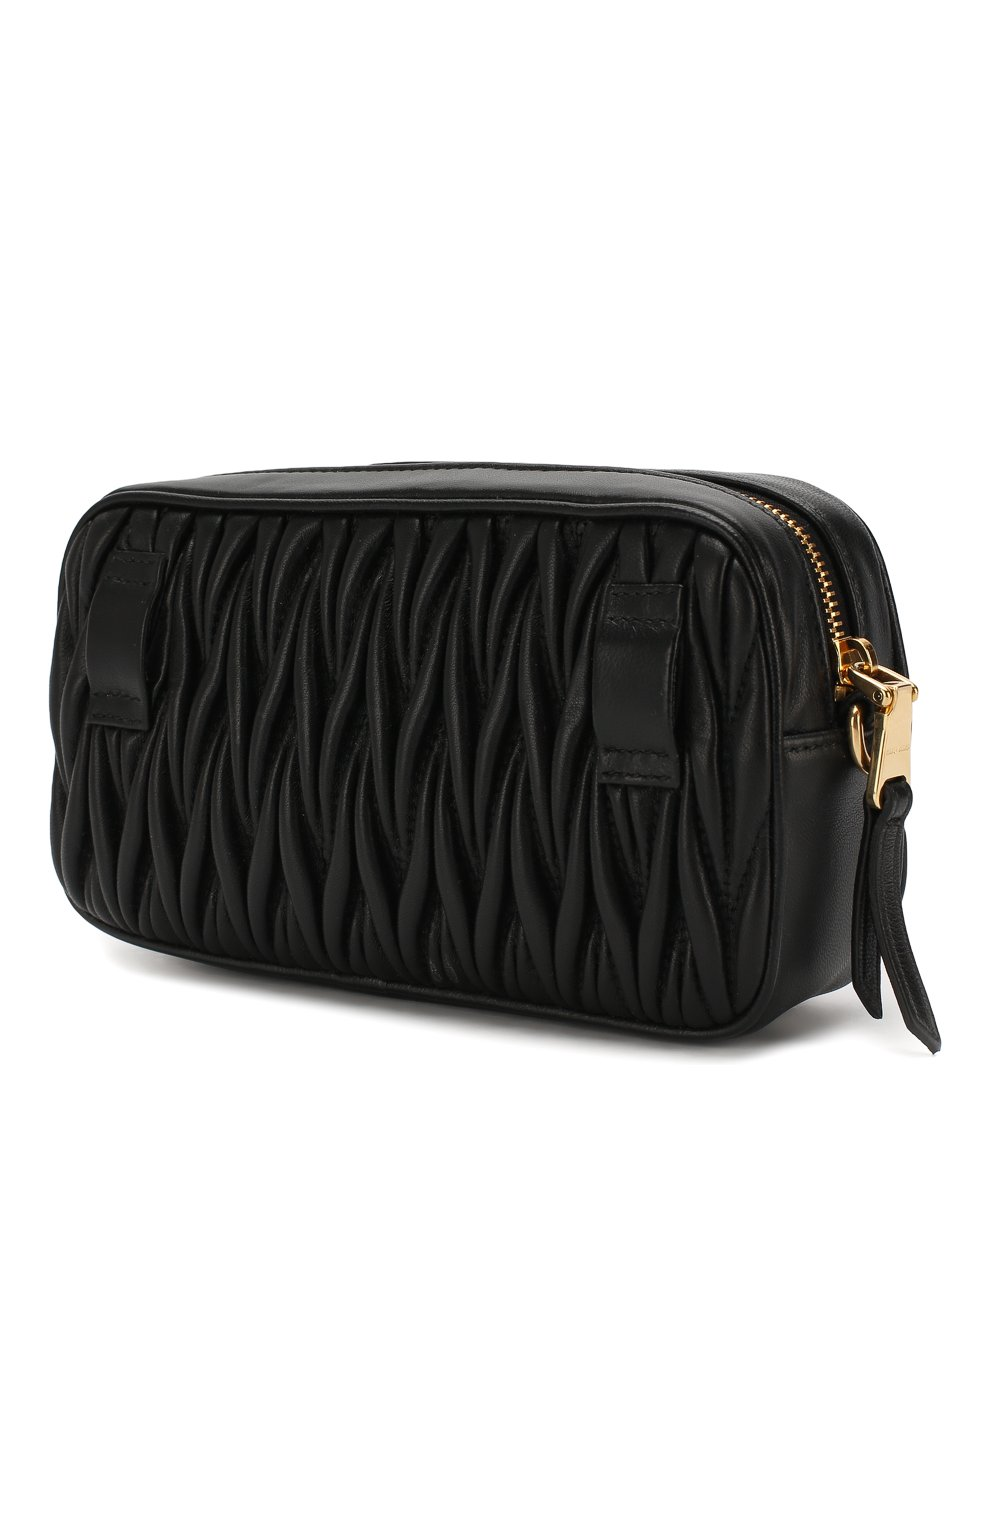 Женская поясная сумка MIU MIU черного цвета, арт. 5BL005-N88-F0002-COO | Фото 3